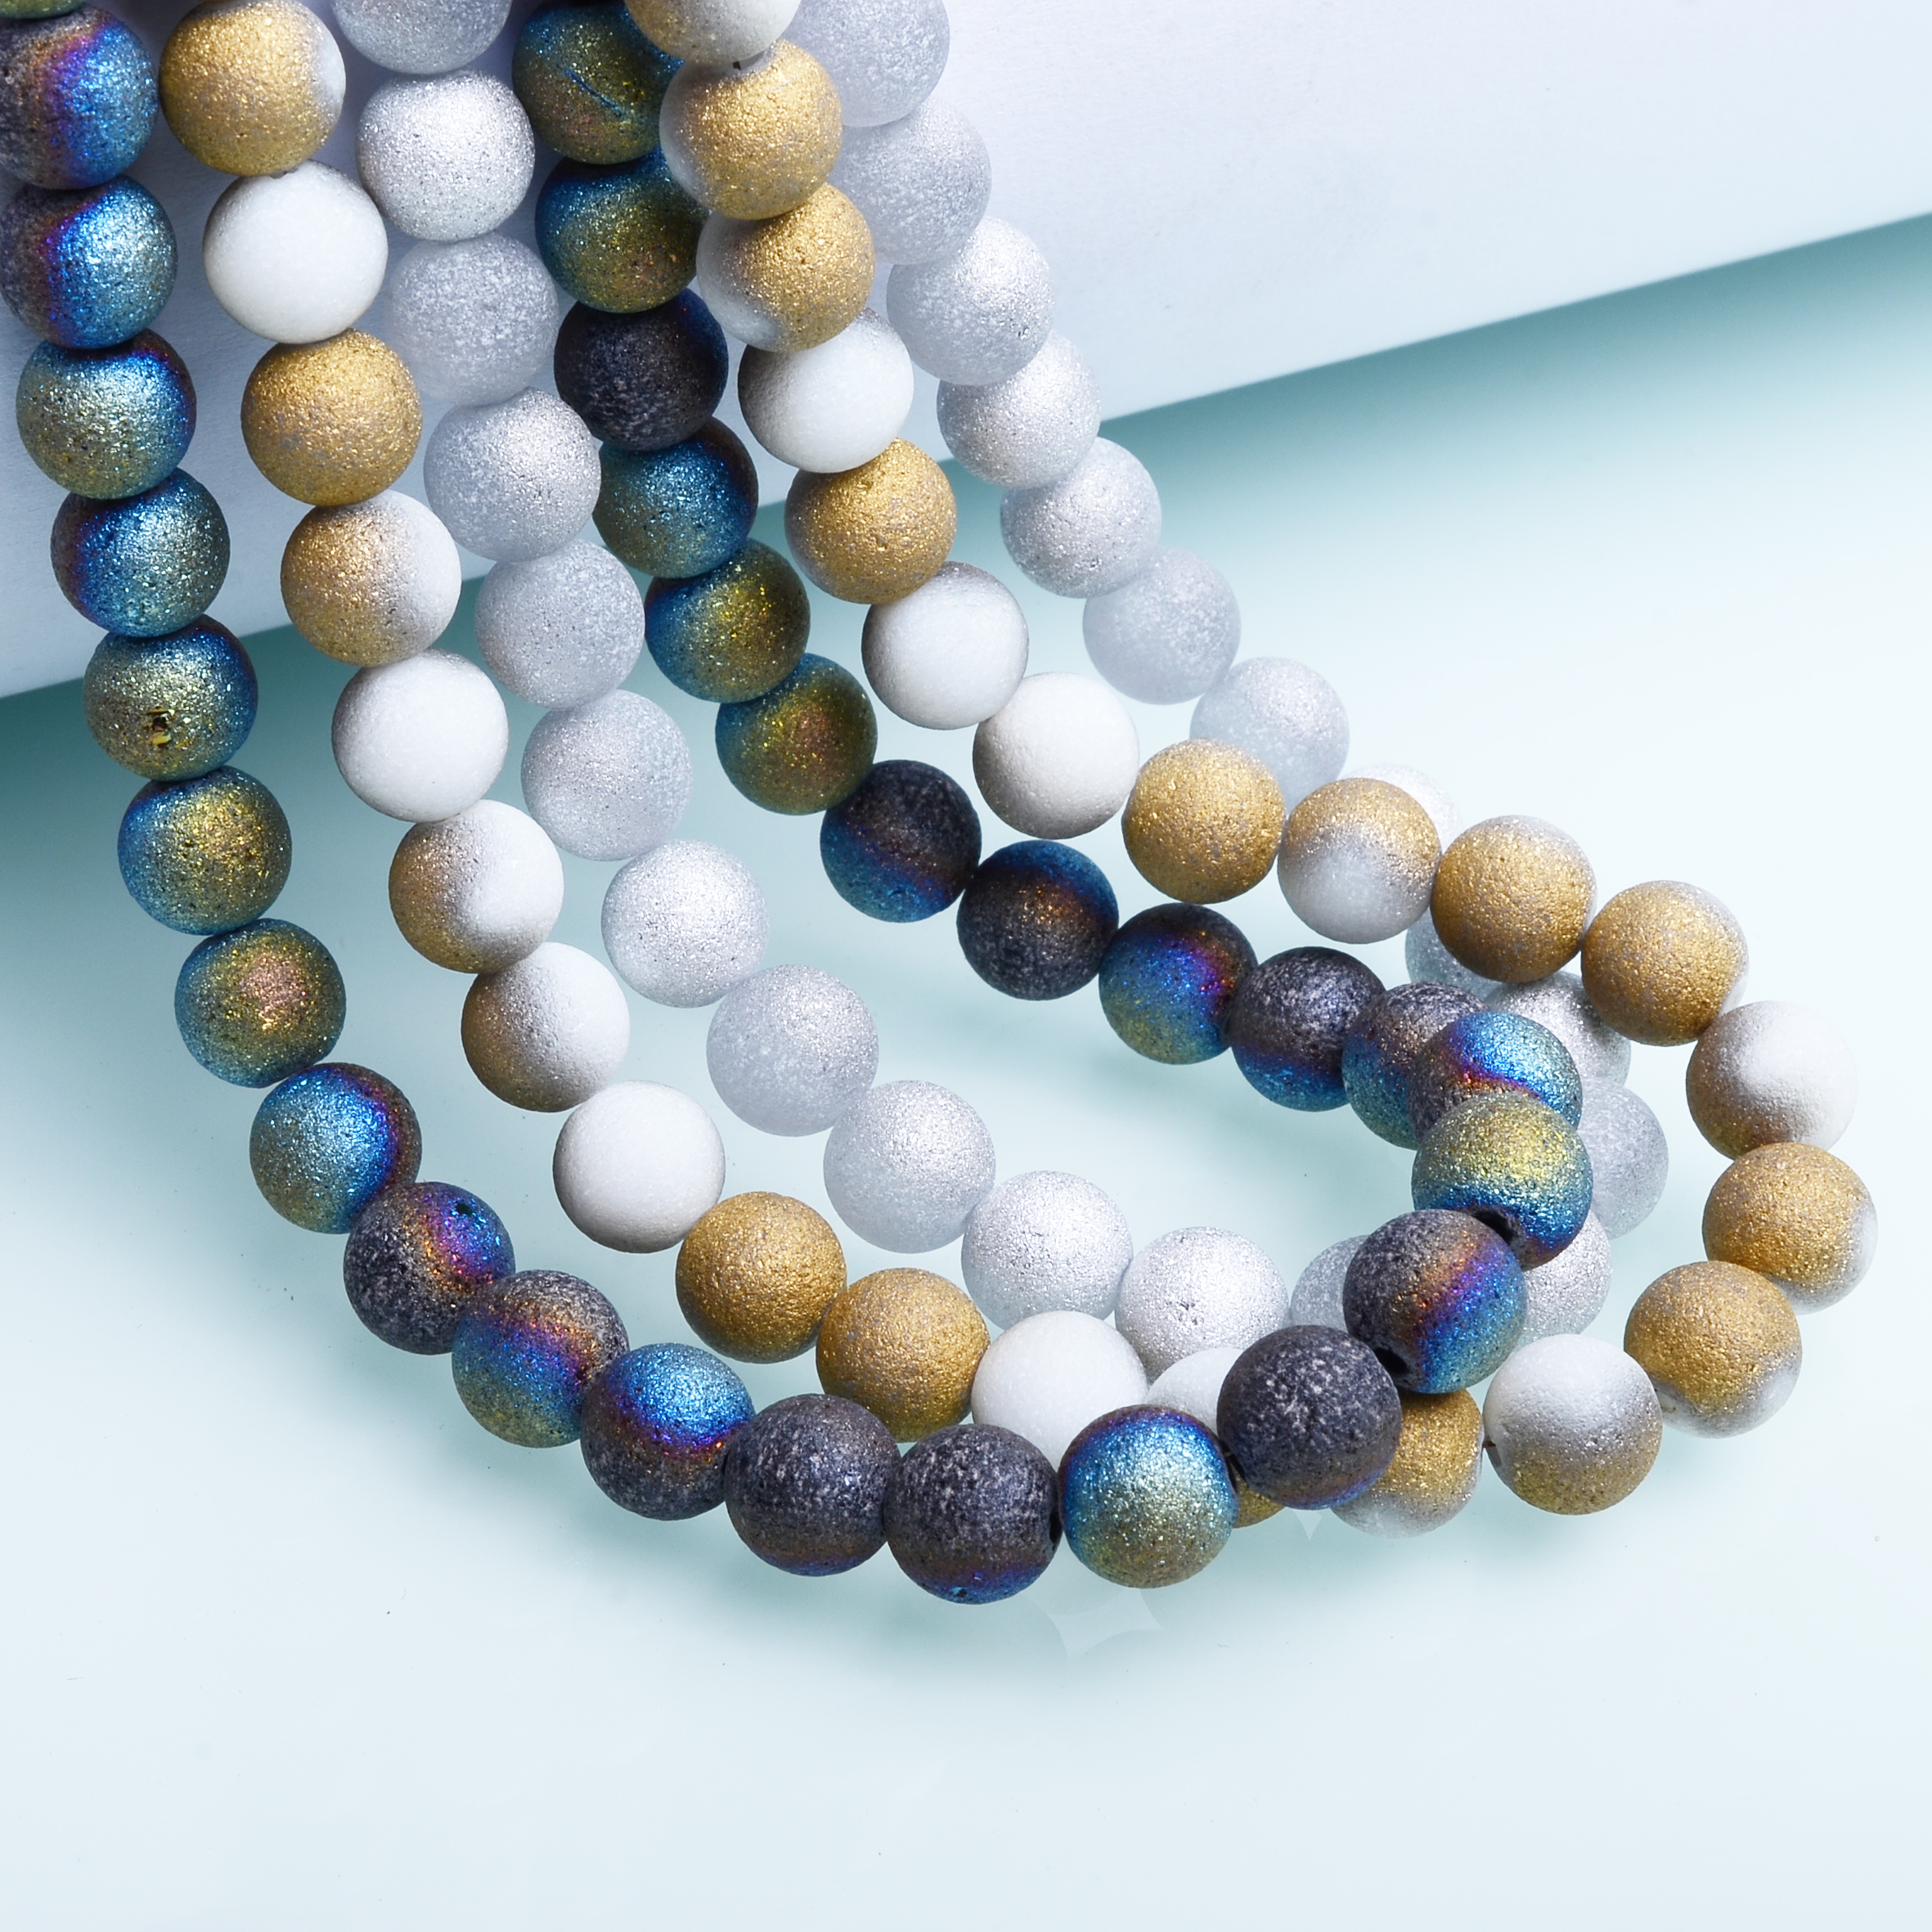 JuleeCrystal 8mm Matte Round Glass Beads Wholesale Imitation Druse Stone Beads for Jewelry Making